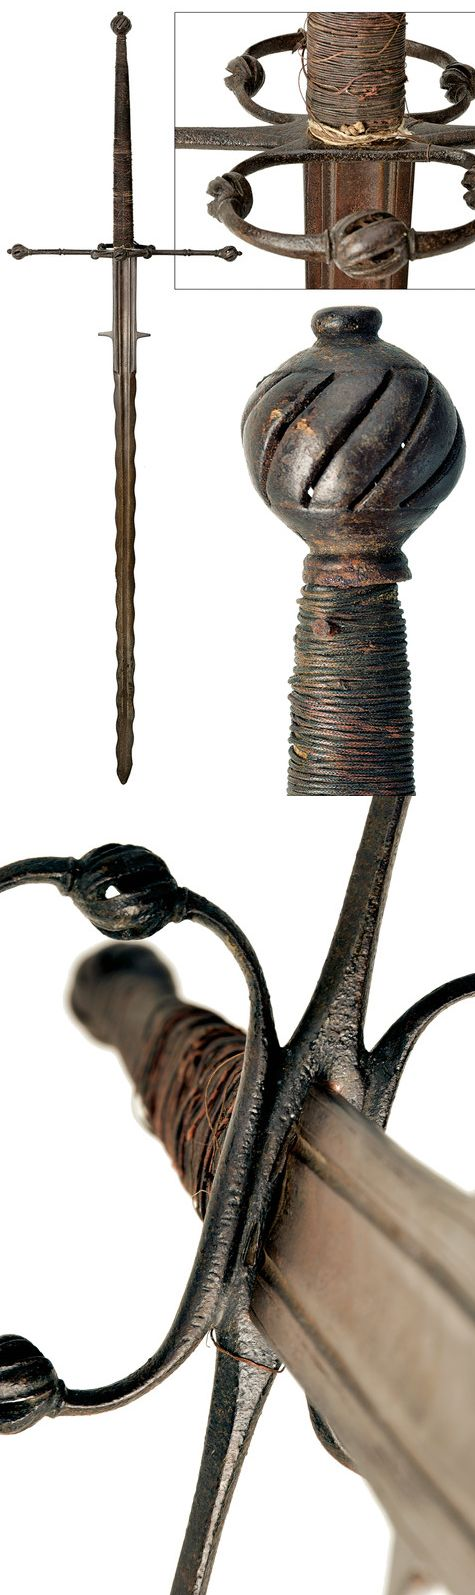 "Mandoble tipo ""flamberge"" - Alemania - Siglo XVI"